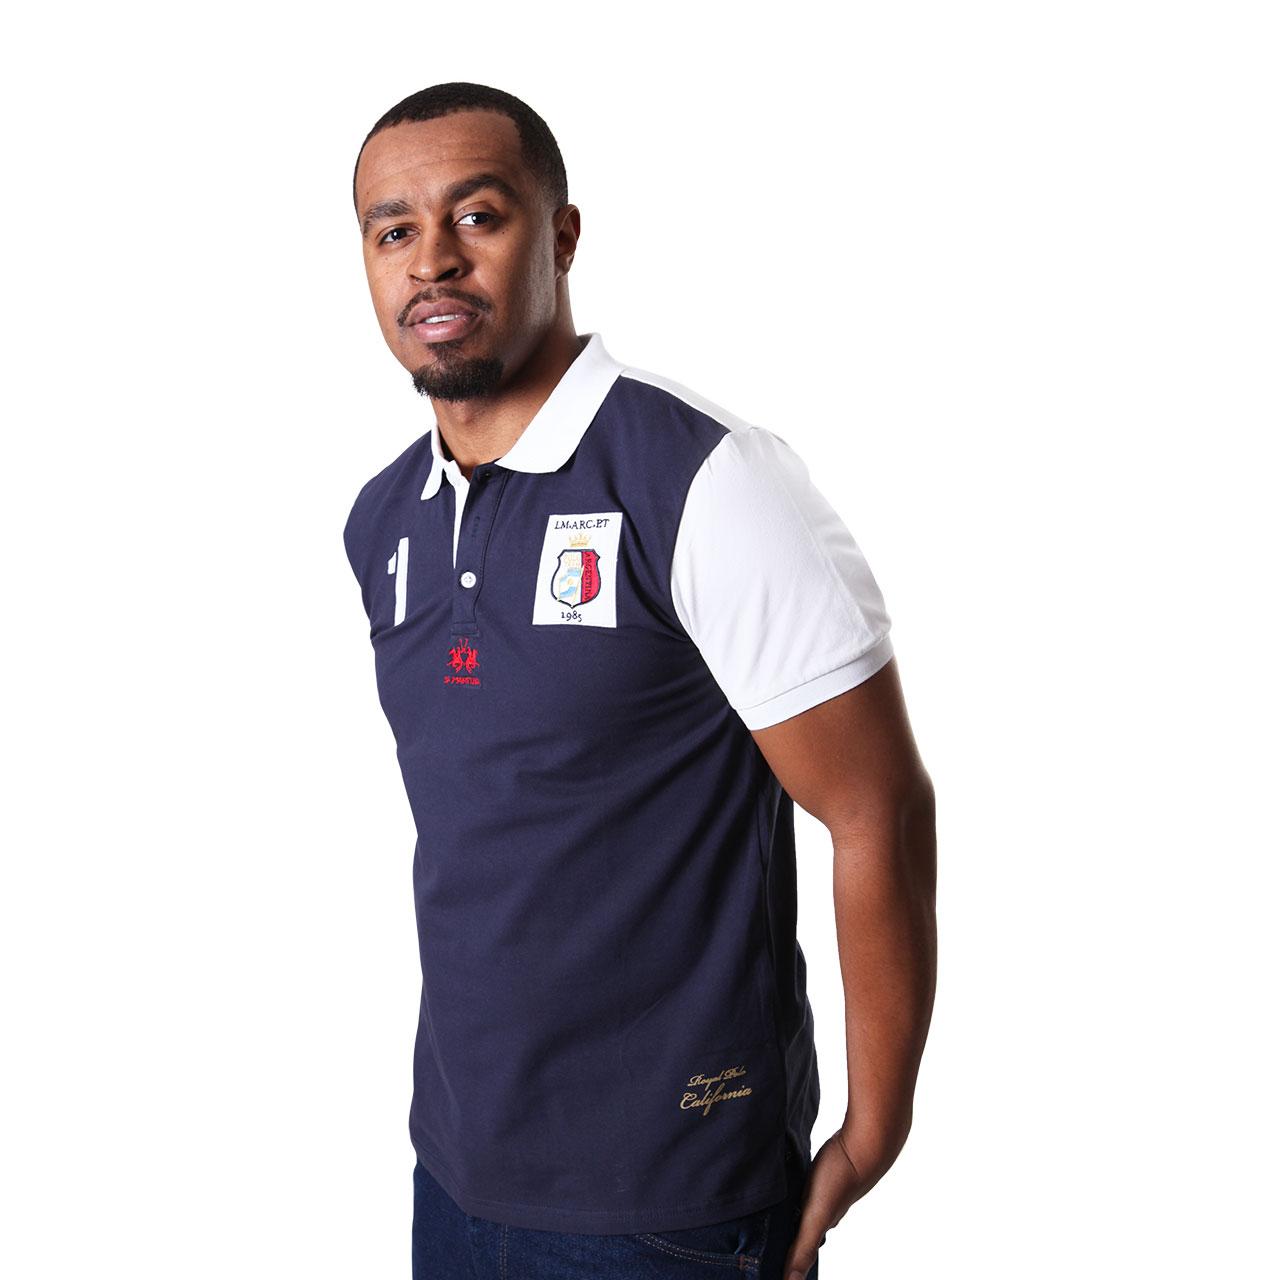 Men's Solid San Luis Comfortable Short Sleeve Navy Blue Polo Shirt